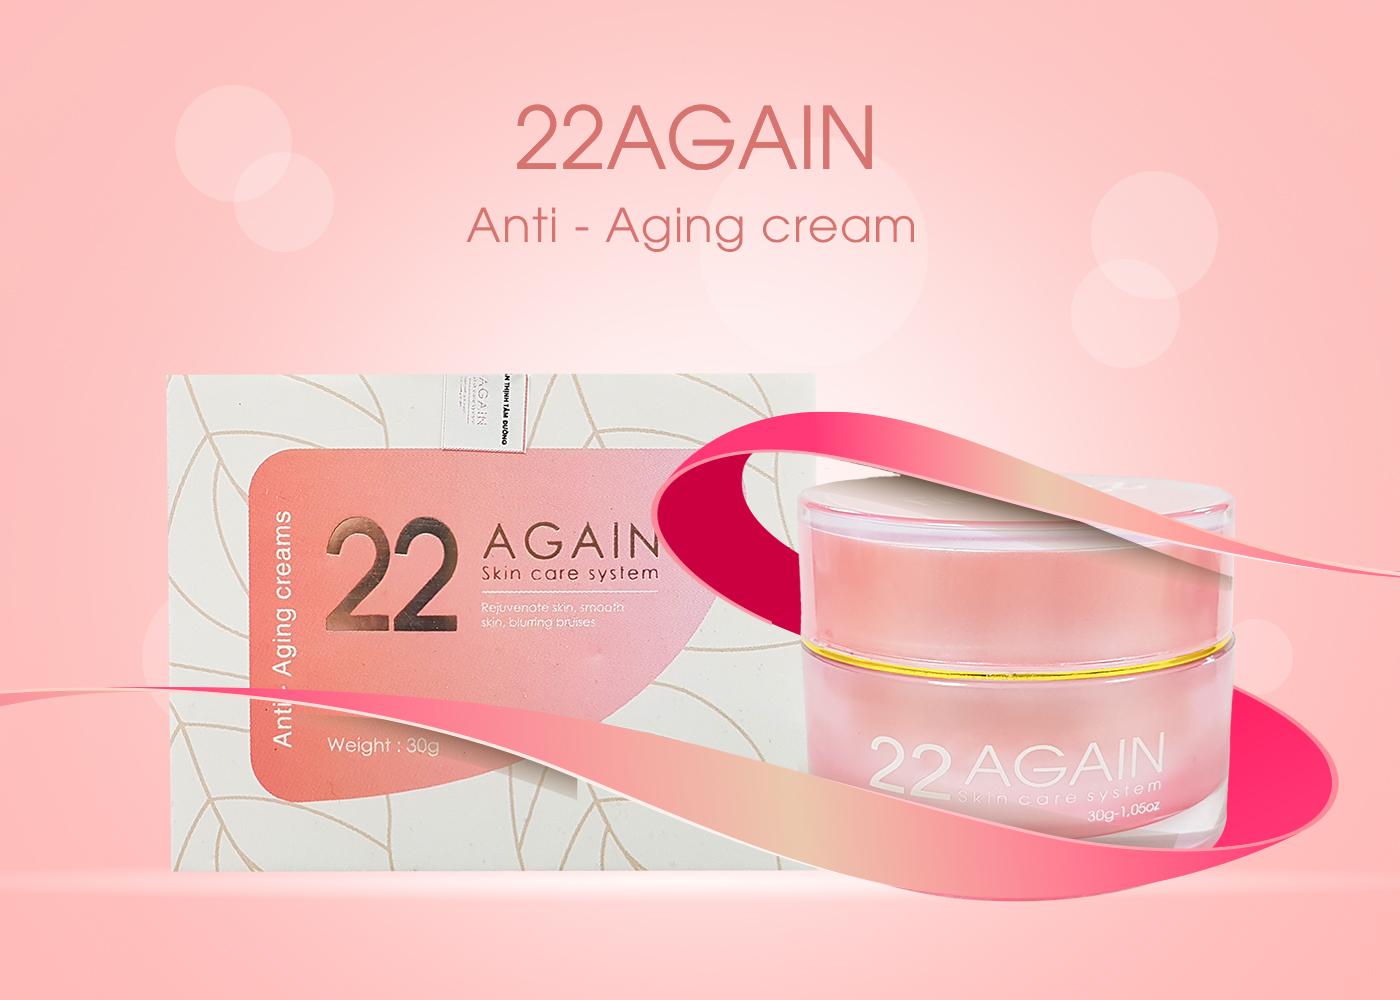 Sản phẩm kem chống lão hóa 22 AGAIN